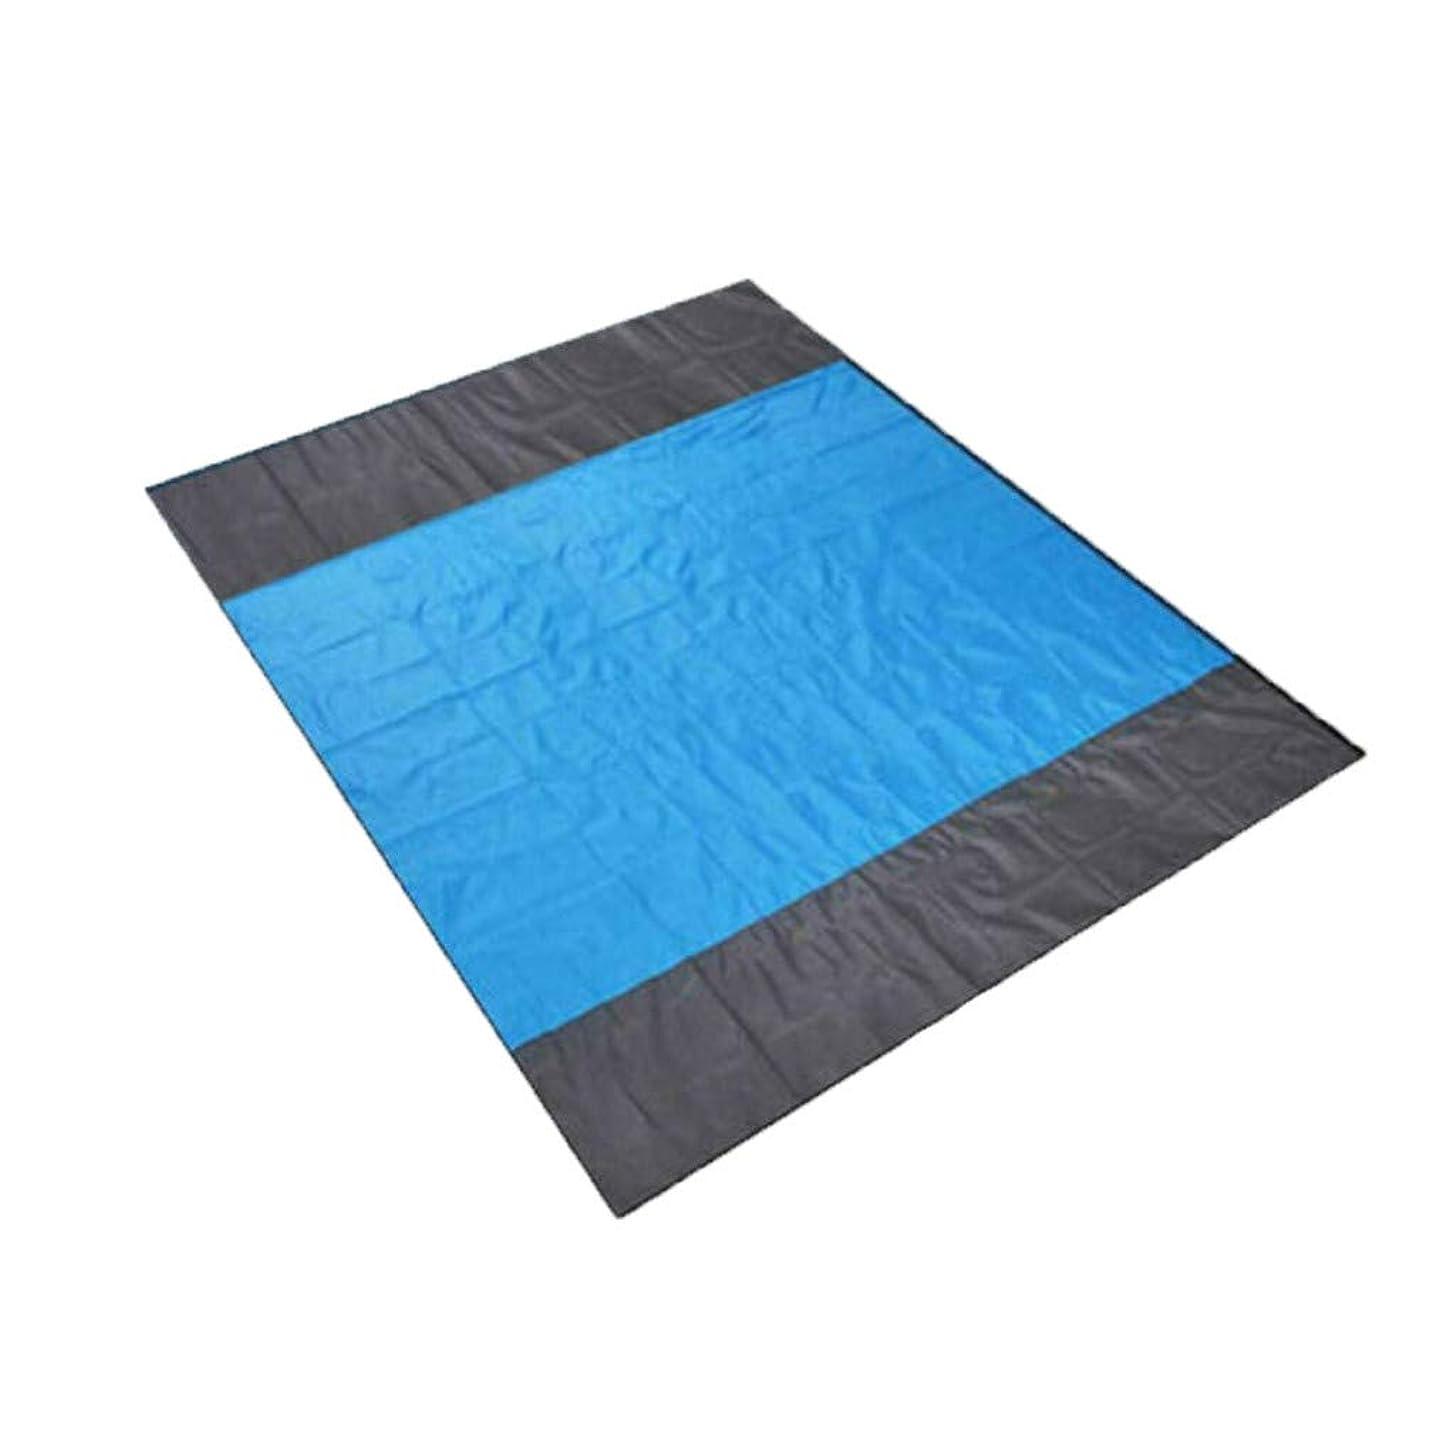 Sand Free Beach Mat Outdoor Picnic Blanket Rug Sandless Compact Waterproof Lightweight Mattress Pad- Picnic Mat for Camping,Hiking (Blue b)